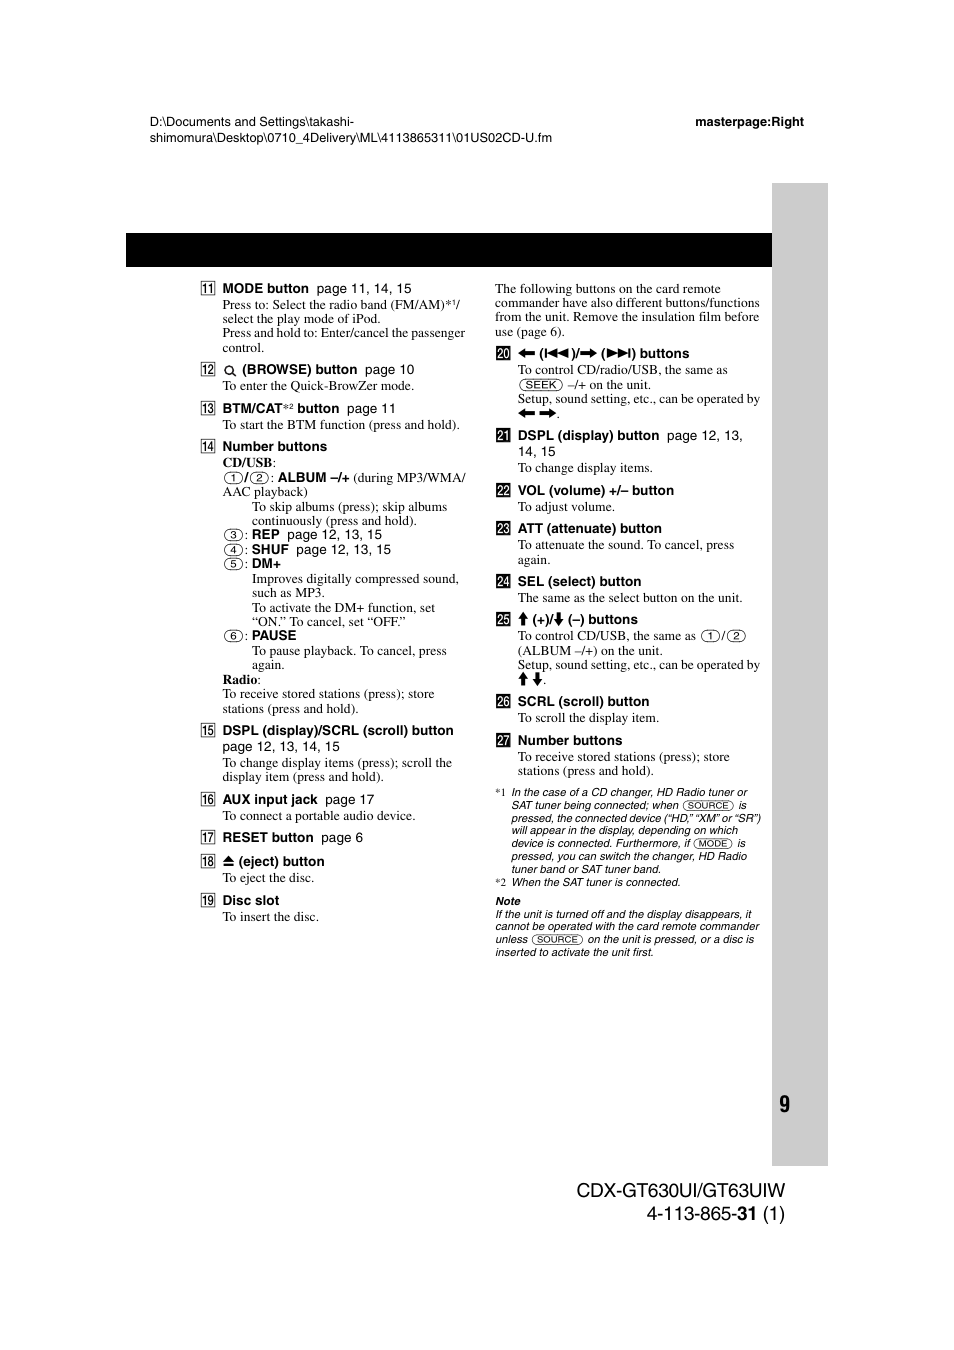 Sony Cdx Gt630ui User Manual Page 9 80 Original Mode Also Sony Cdx GT Wiring -Diagram Sony Cdx Gt630ui Wiring Diagram